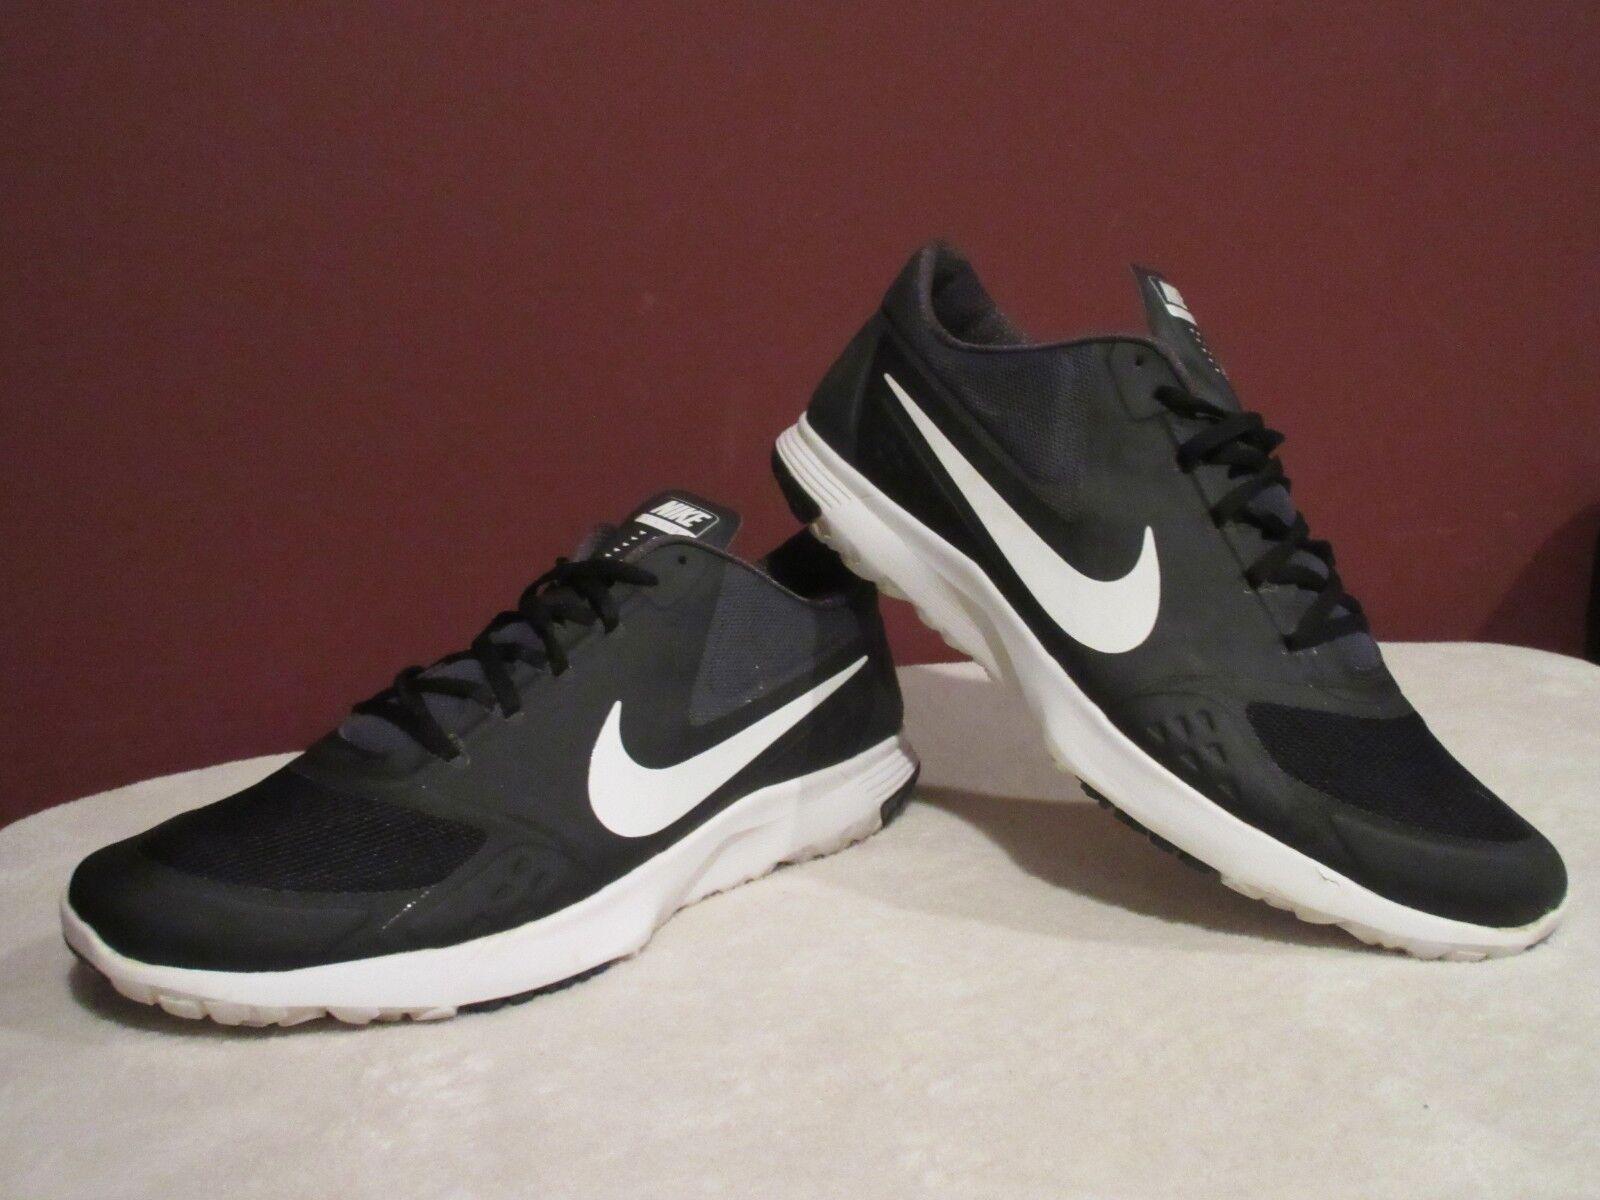 Nike fs lite trainer 2 2 2 (683141 002) scarpe uomini '13 | Nuova voce  b08c7d